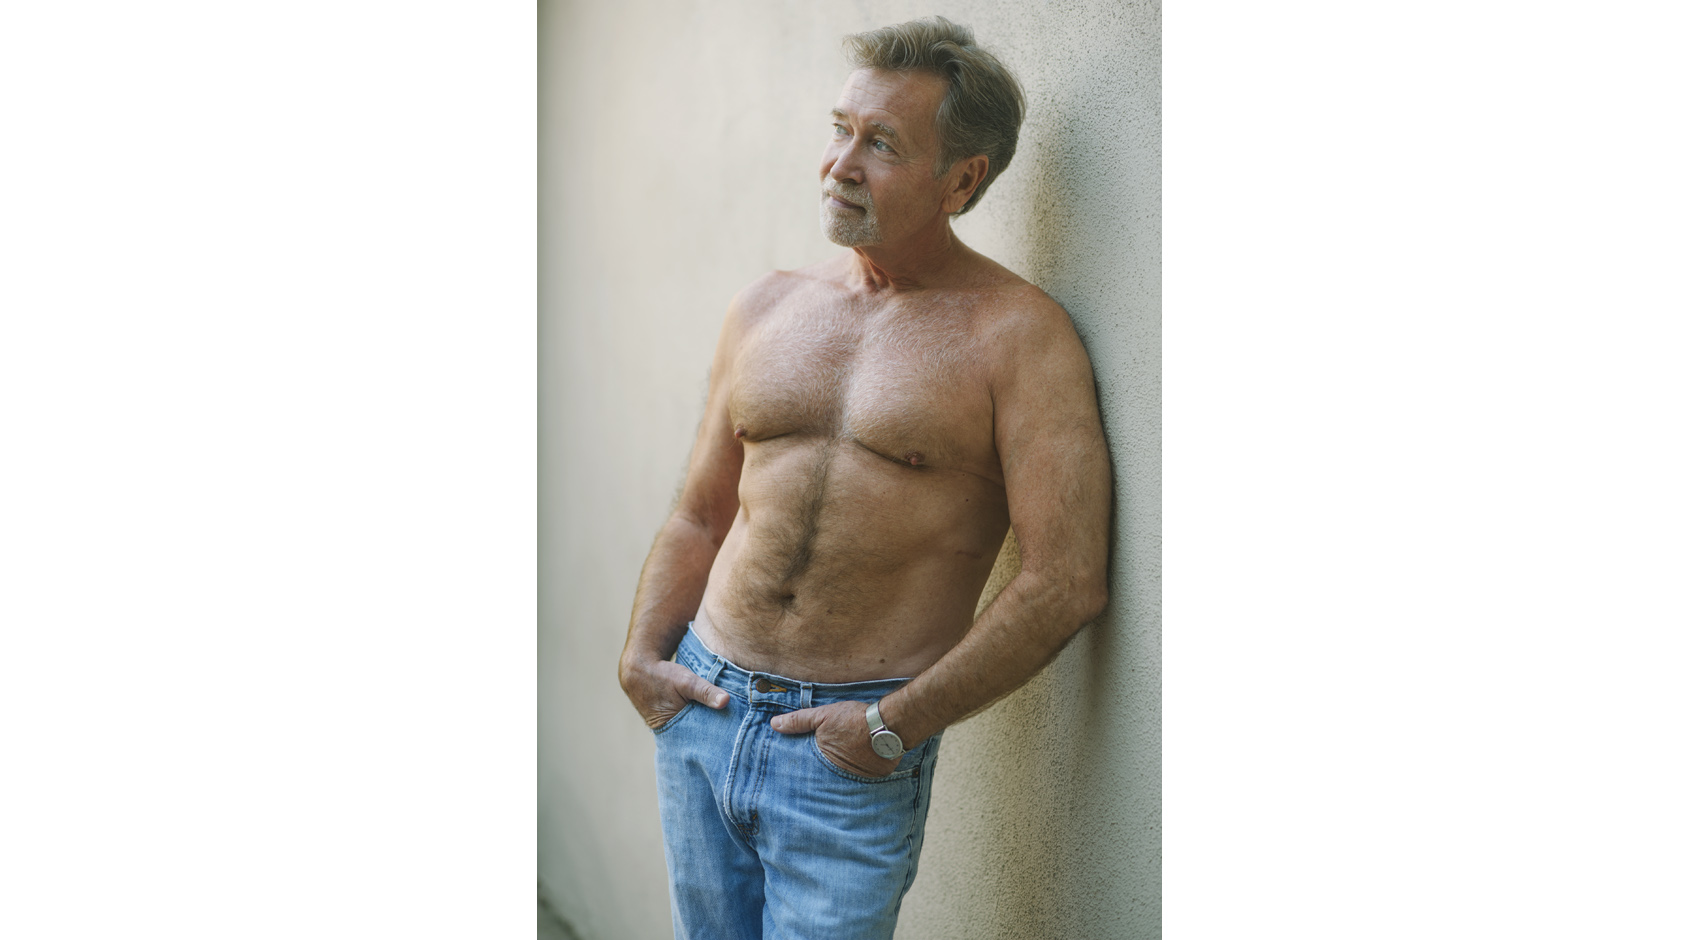 steve b age 67 artist tommy alan